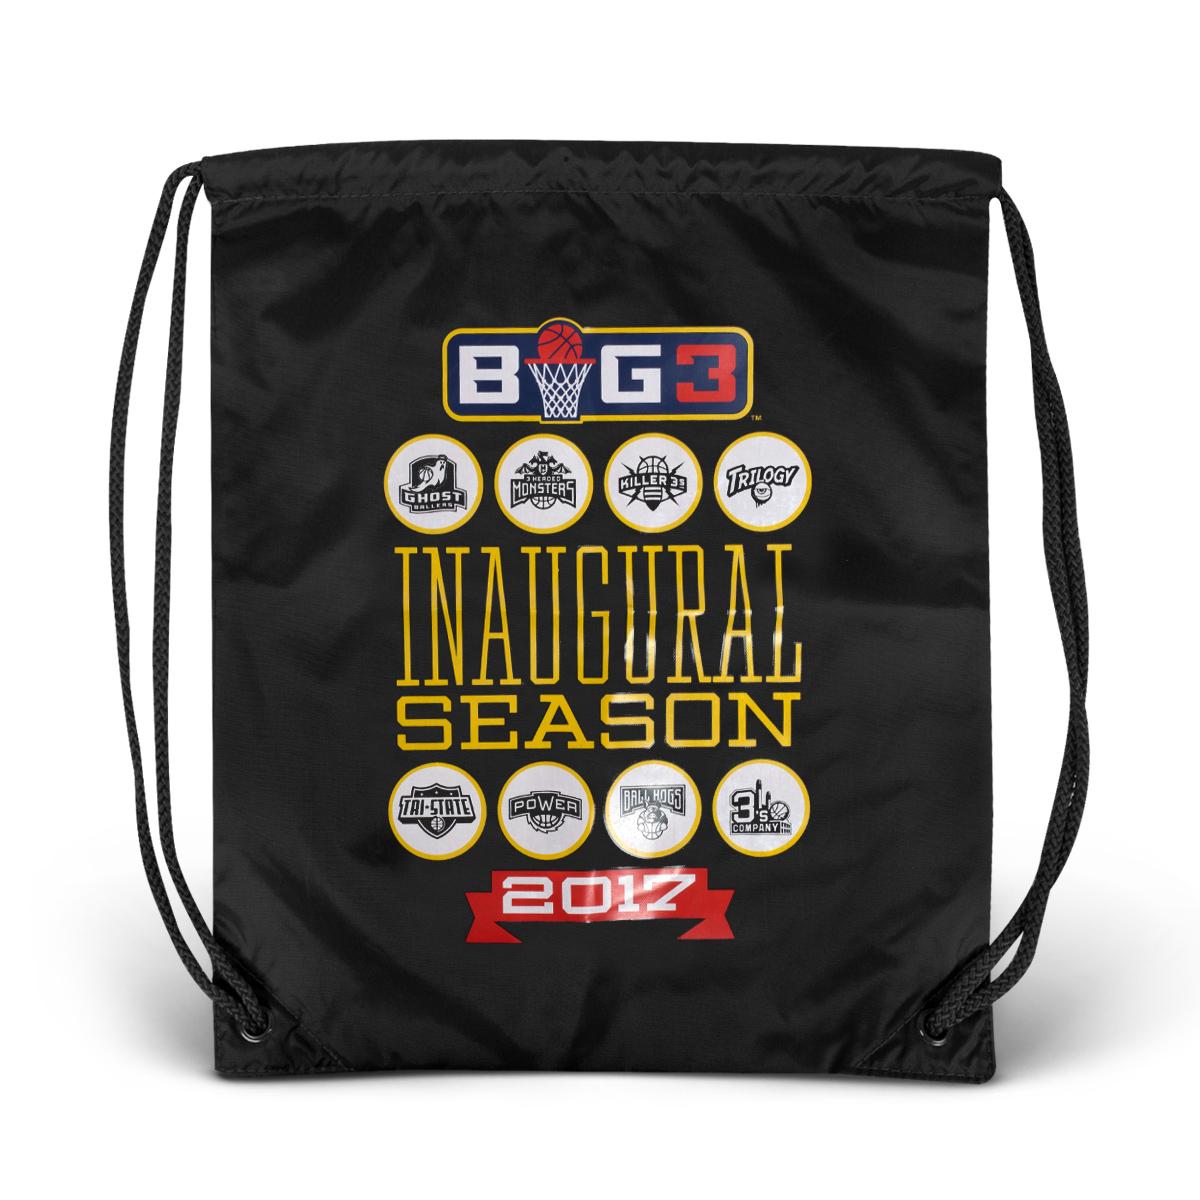 2017 Inaugural Season Black Drawstring Bag